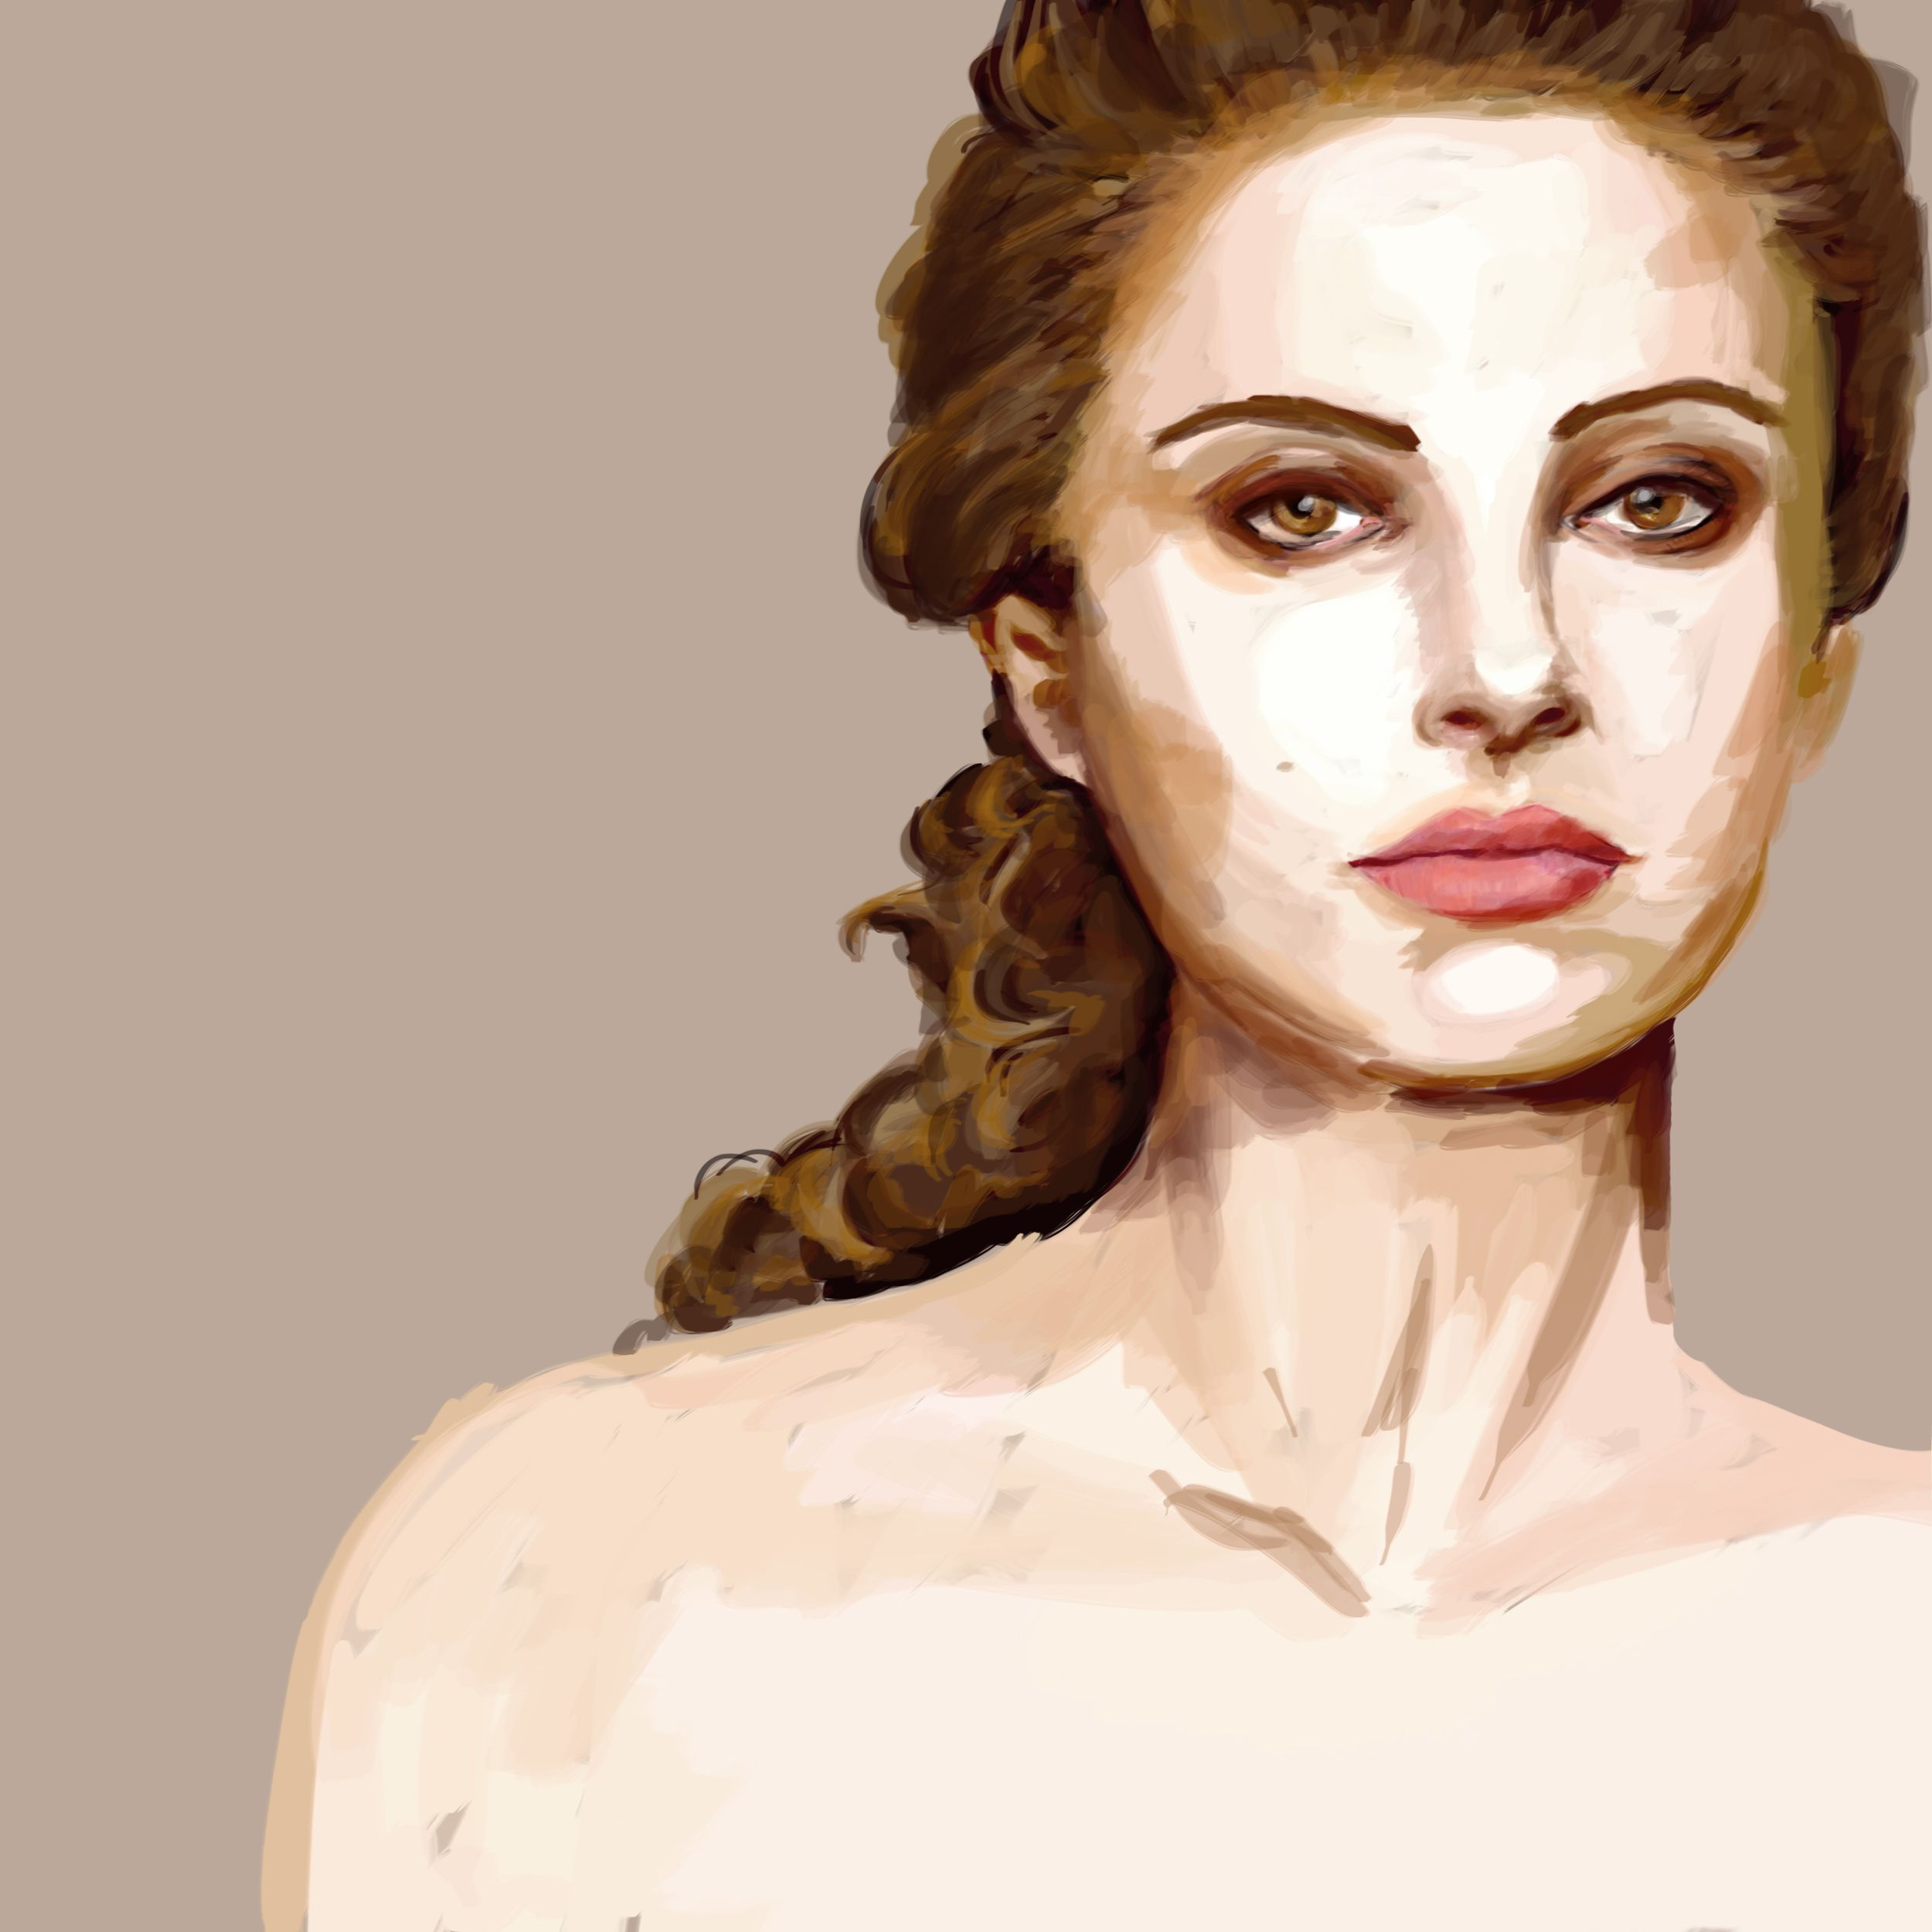 Padme Amidala Star Wars Digital painting Natalie Portman